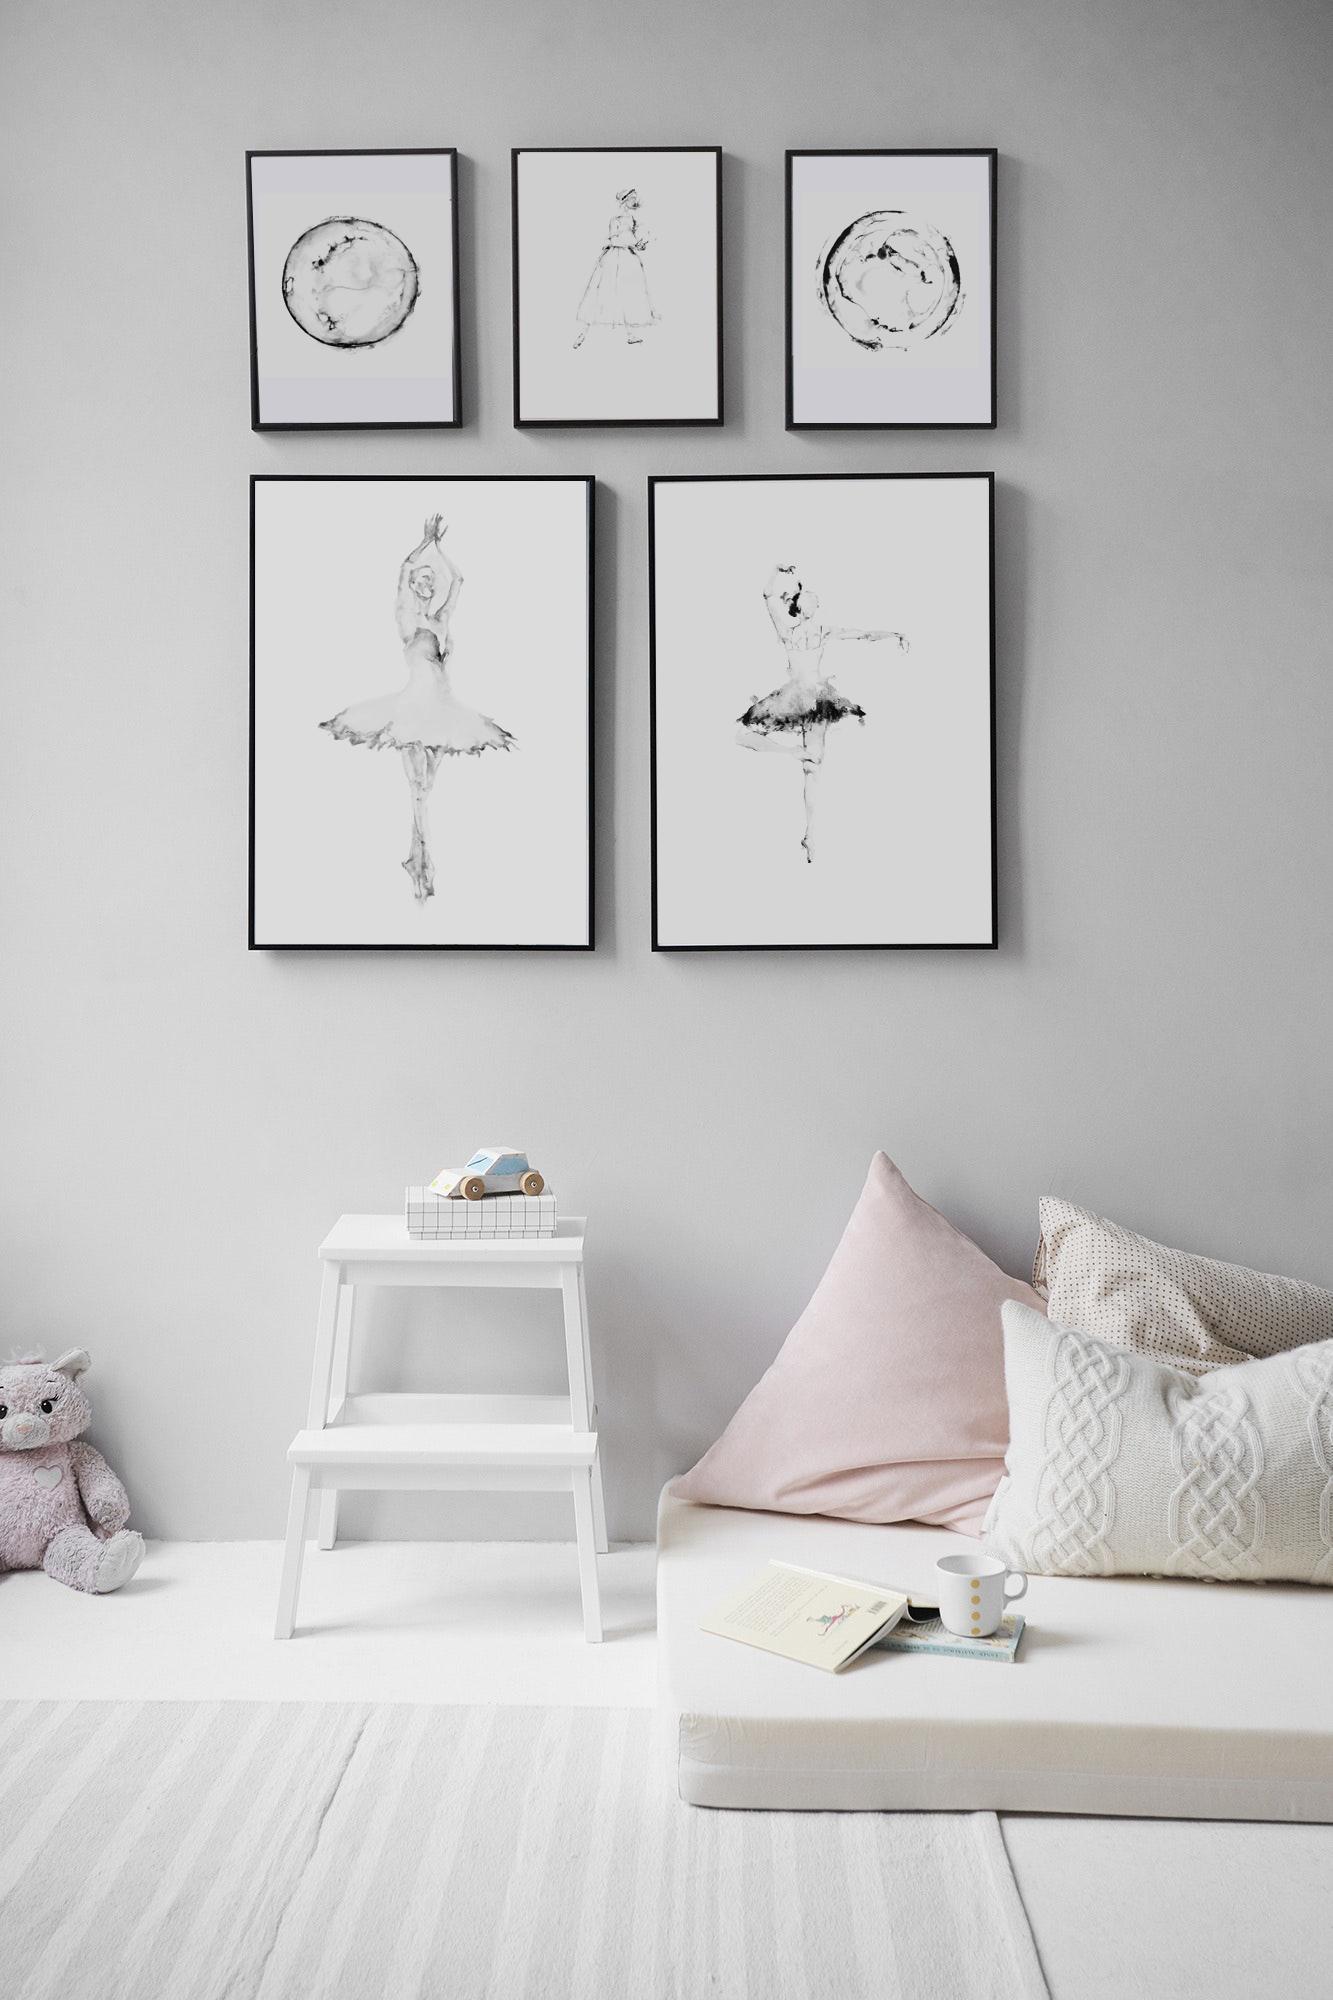 Ballerina Prints by Felipe